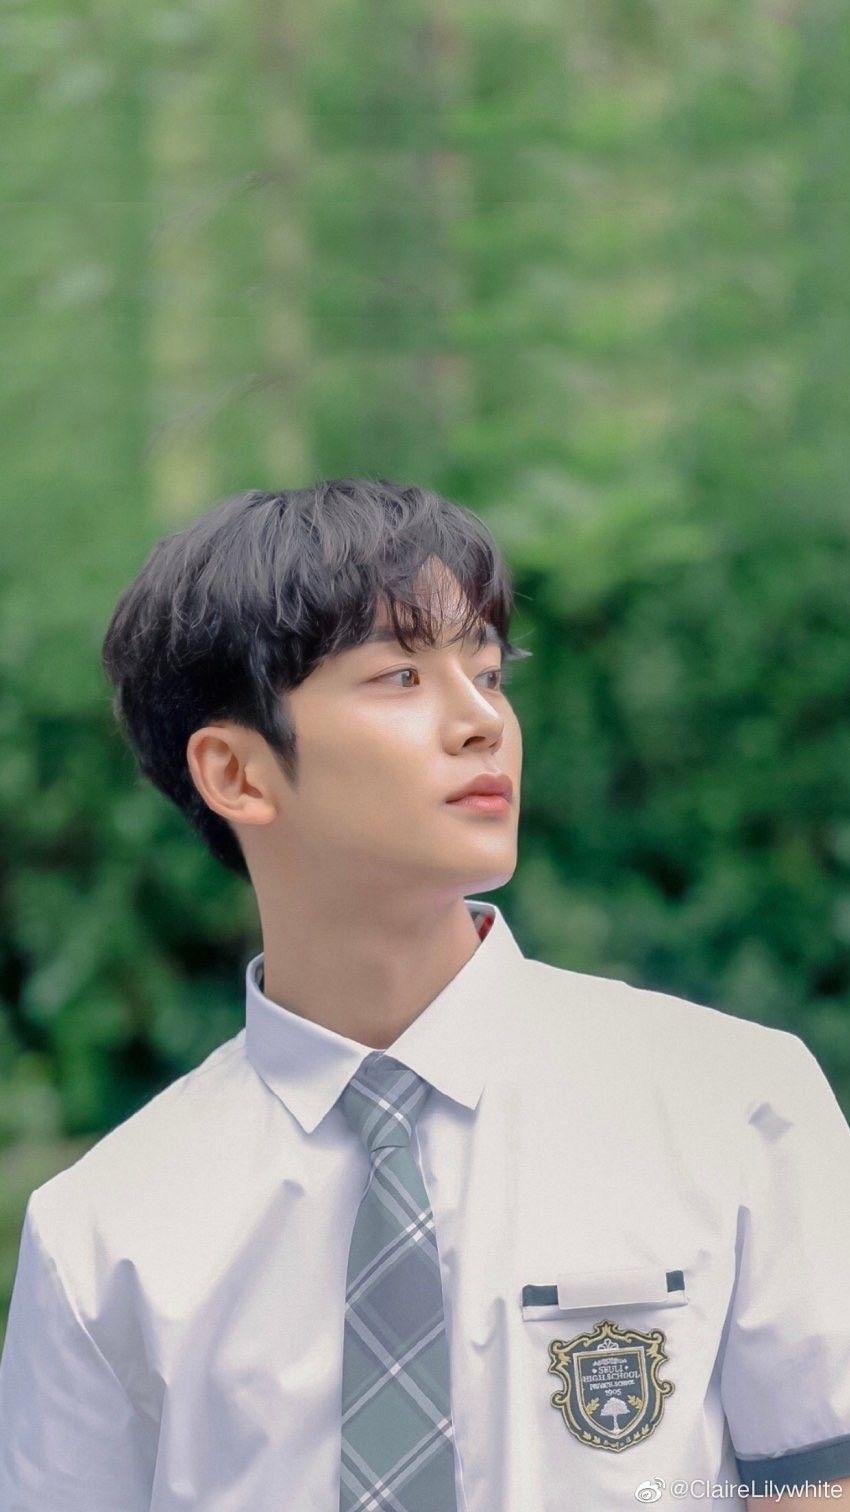 Drama Korea Tentang Ceo Ganteng : drama, korea, tentang, ganteng, Lockscreen, Lucu,, Bagus,, Laki-laki, Tampan